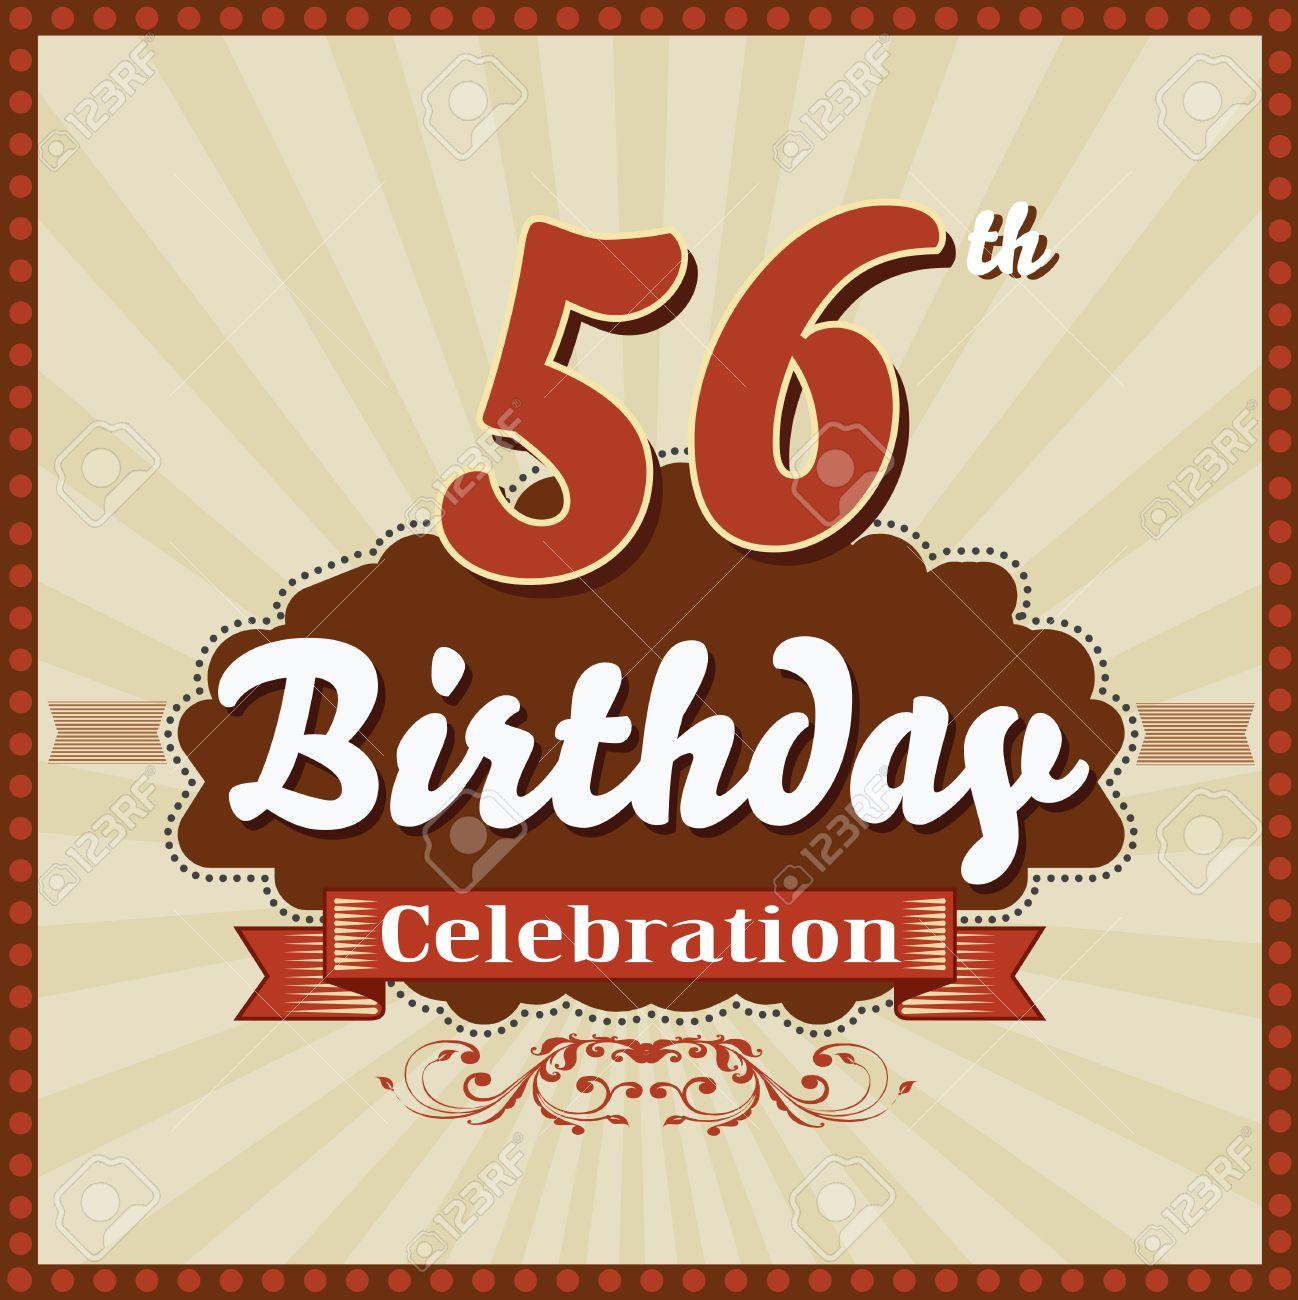 56 Year Happy Birthday Celebration Retro Style Card Vector Eps10 Stock